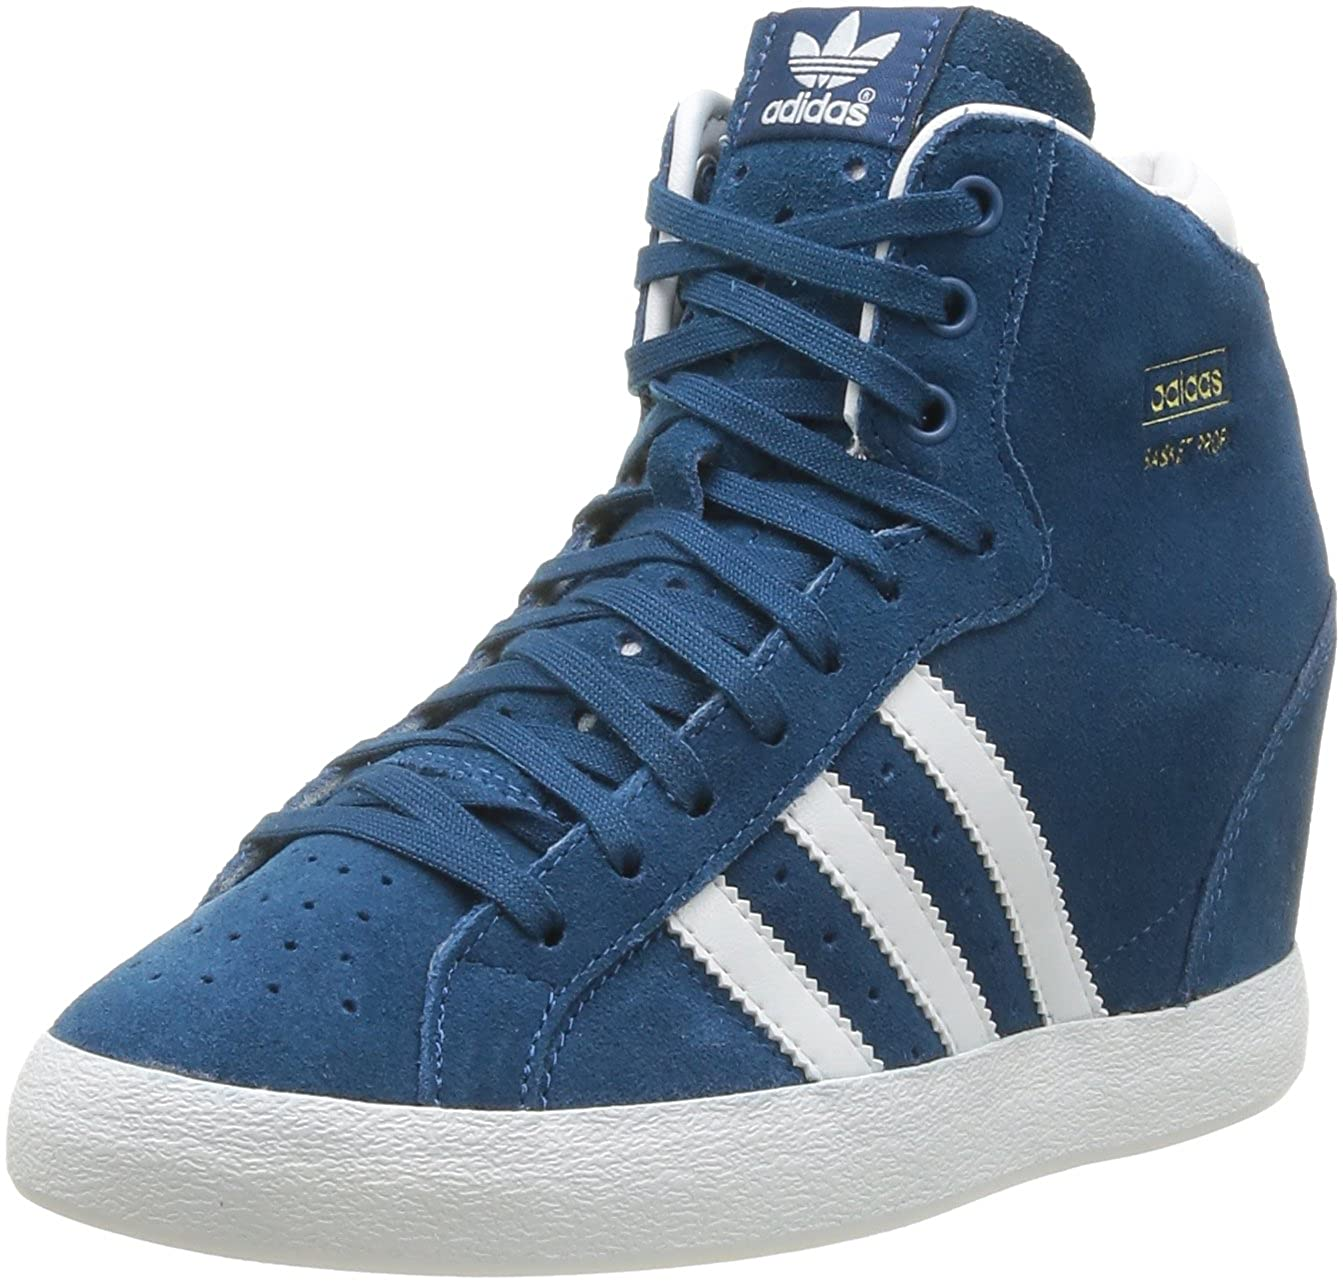 competitive price e943a 95e06 adidas Womens Basket Profi Up W Gymnastics Shoes Blue Size 3.5  Amazon.co.uk Shoes  Bags